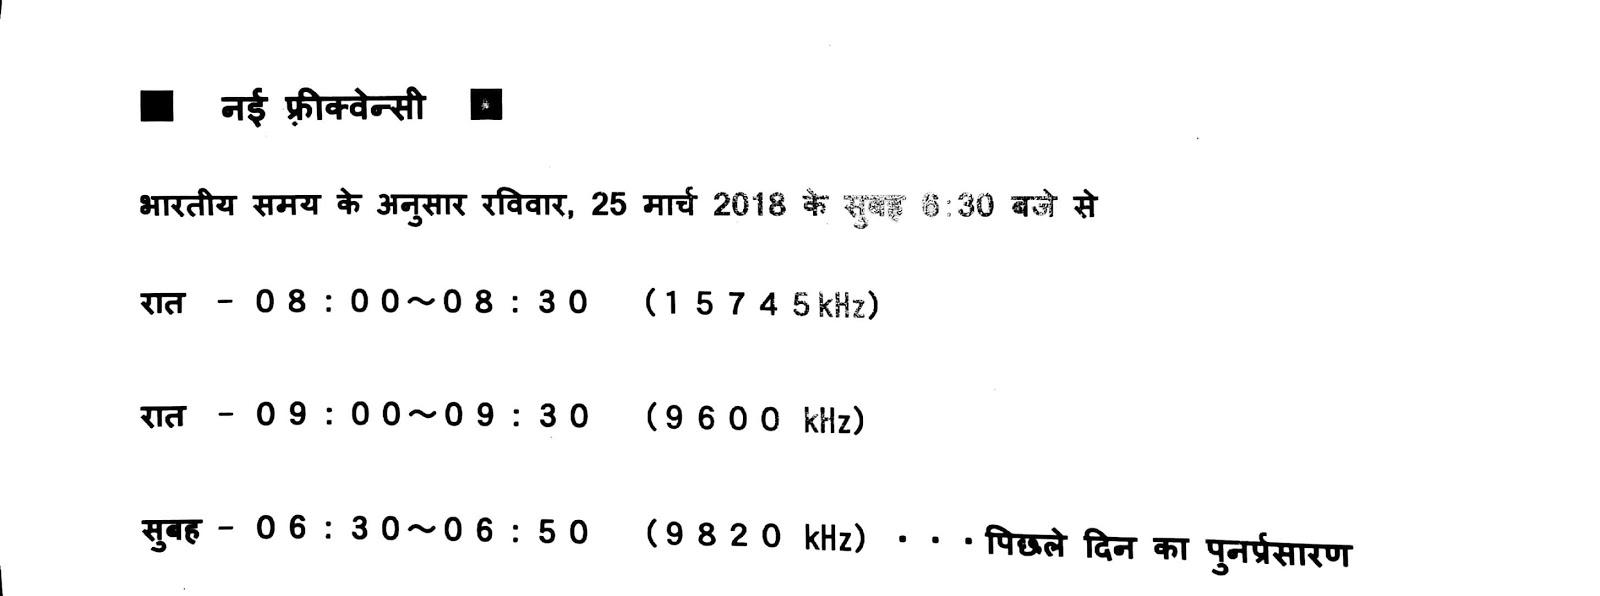 NHK Hindi Schedule